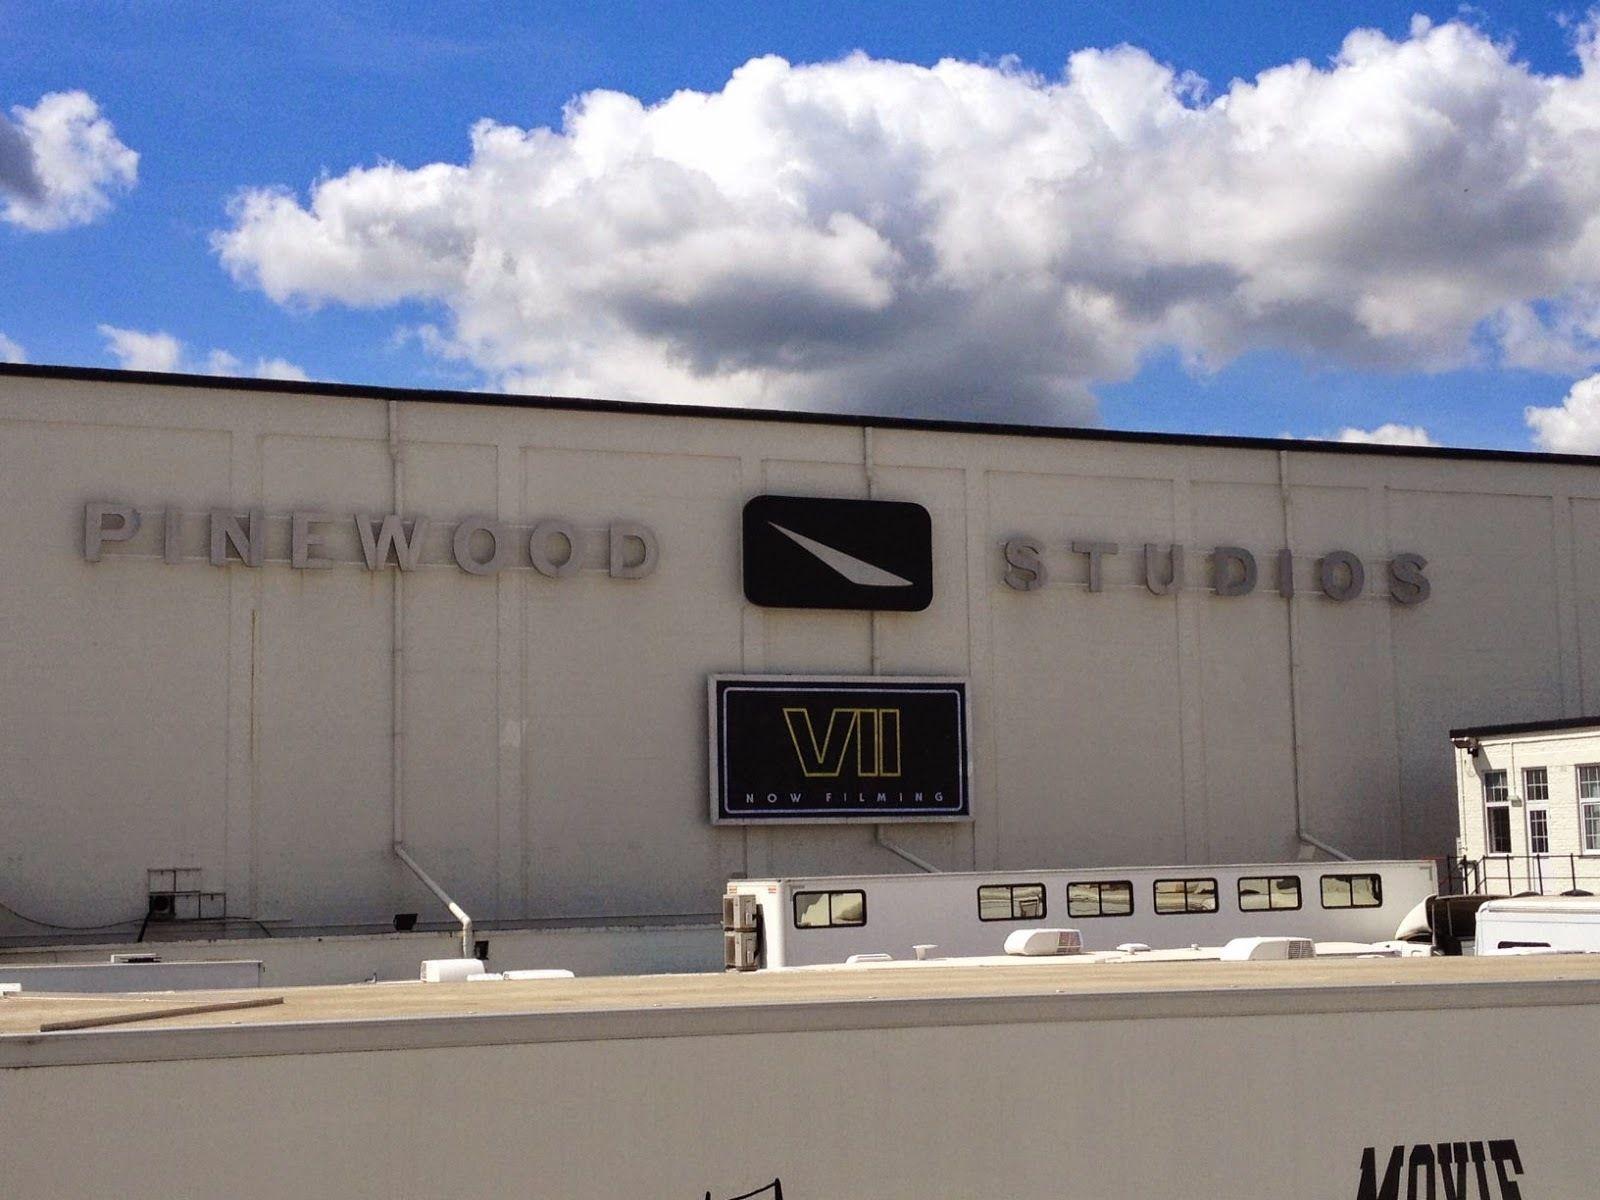 Star Wars VII The Force Awakens 35 - Pinewook Studios